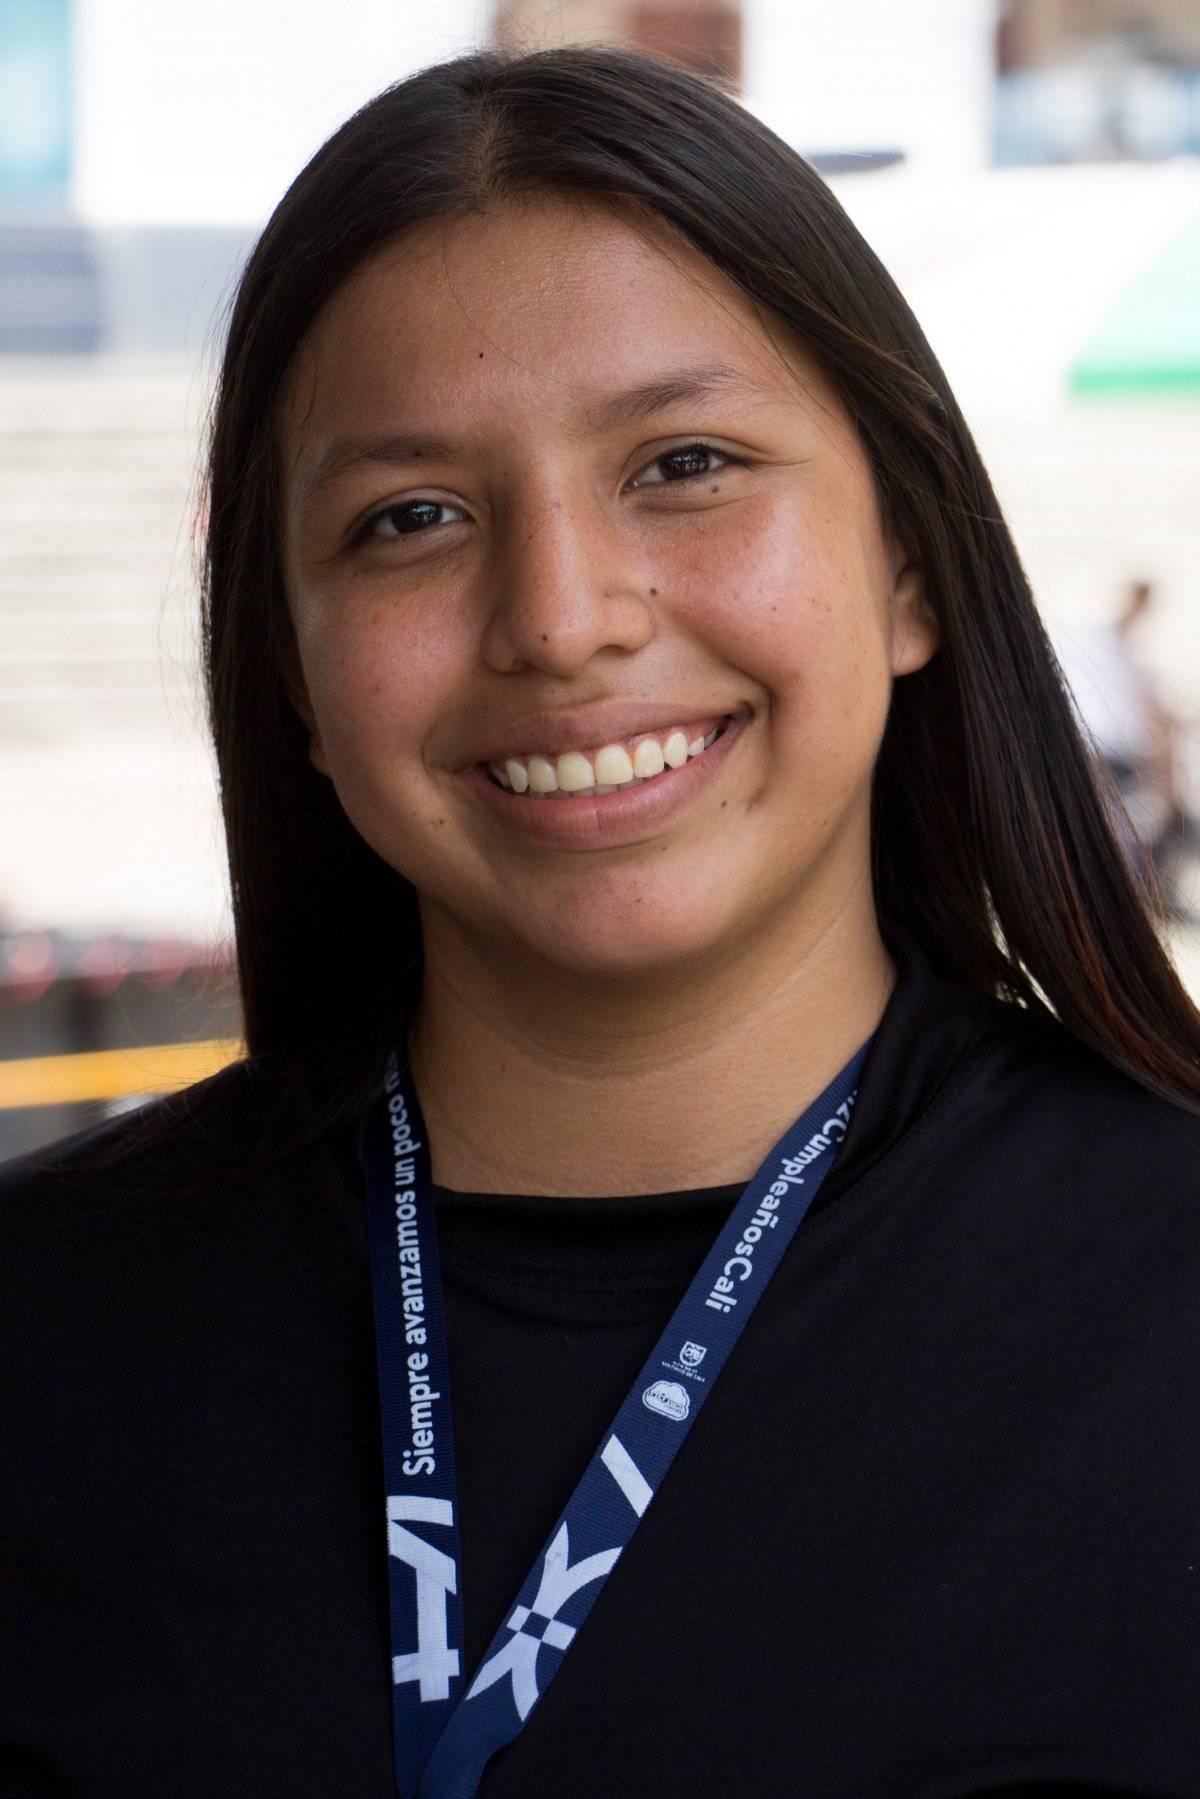 Andrea Guerrero estudiante Cali